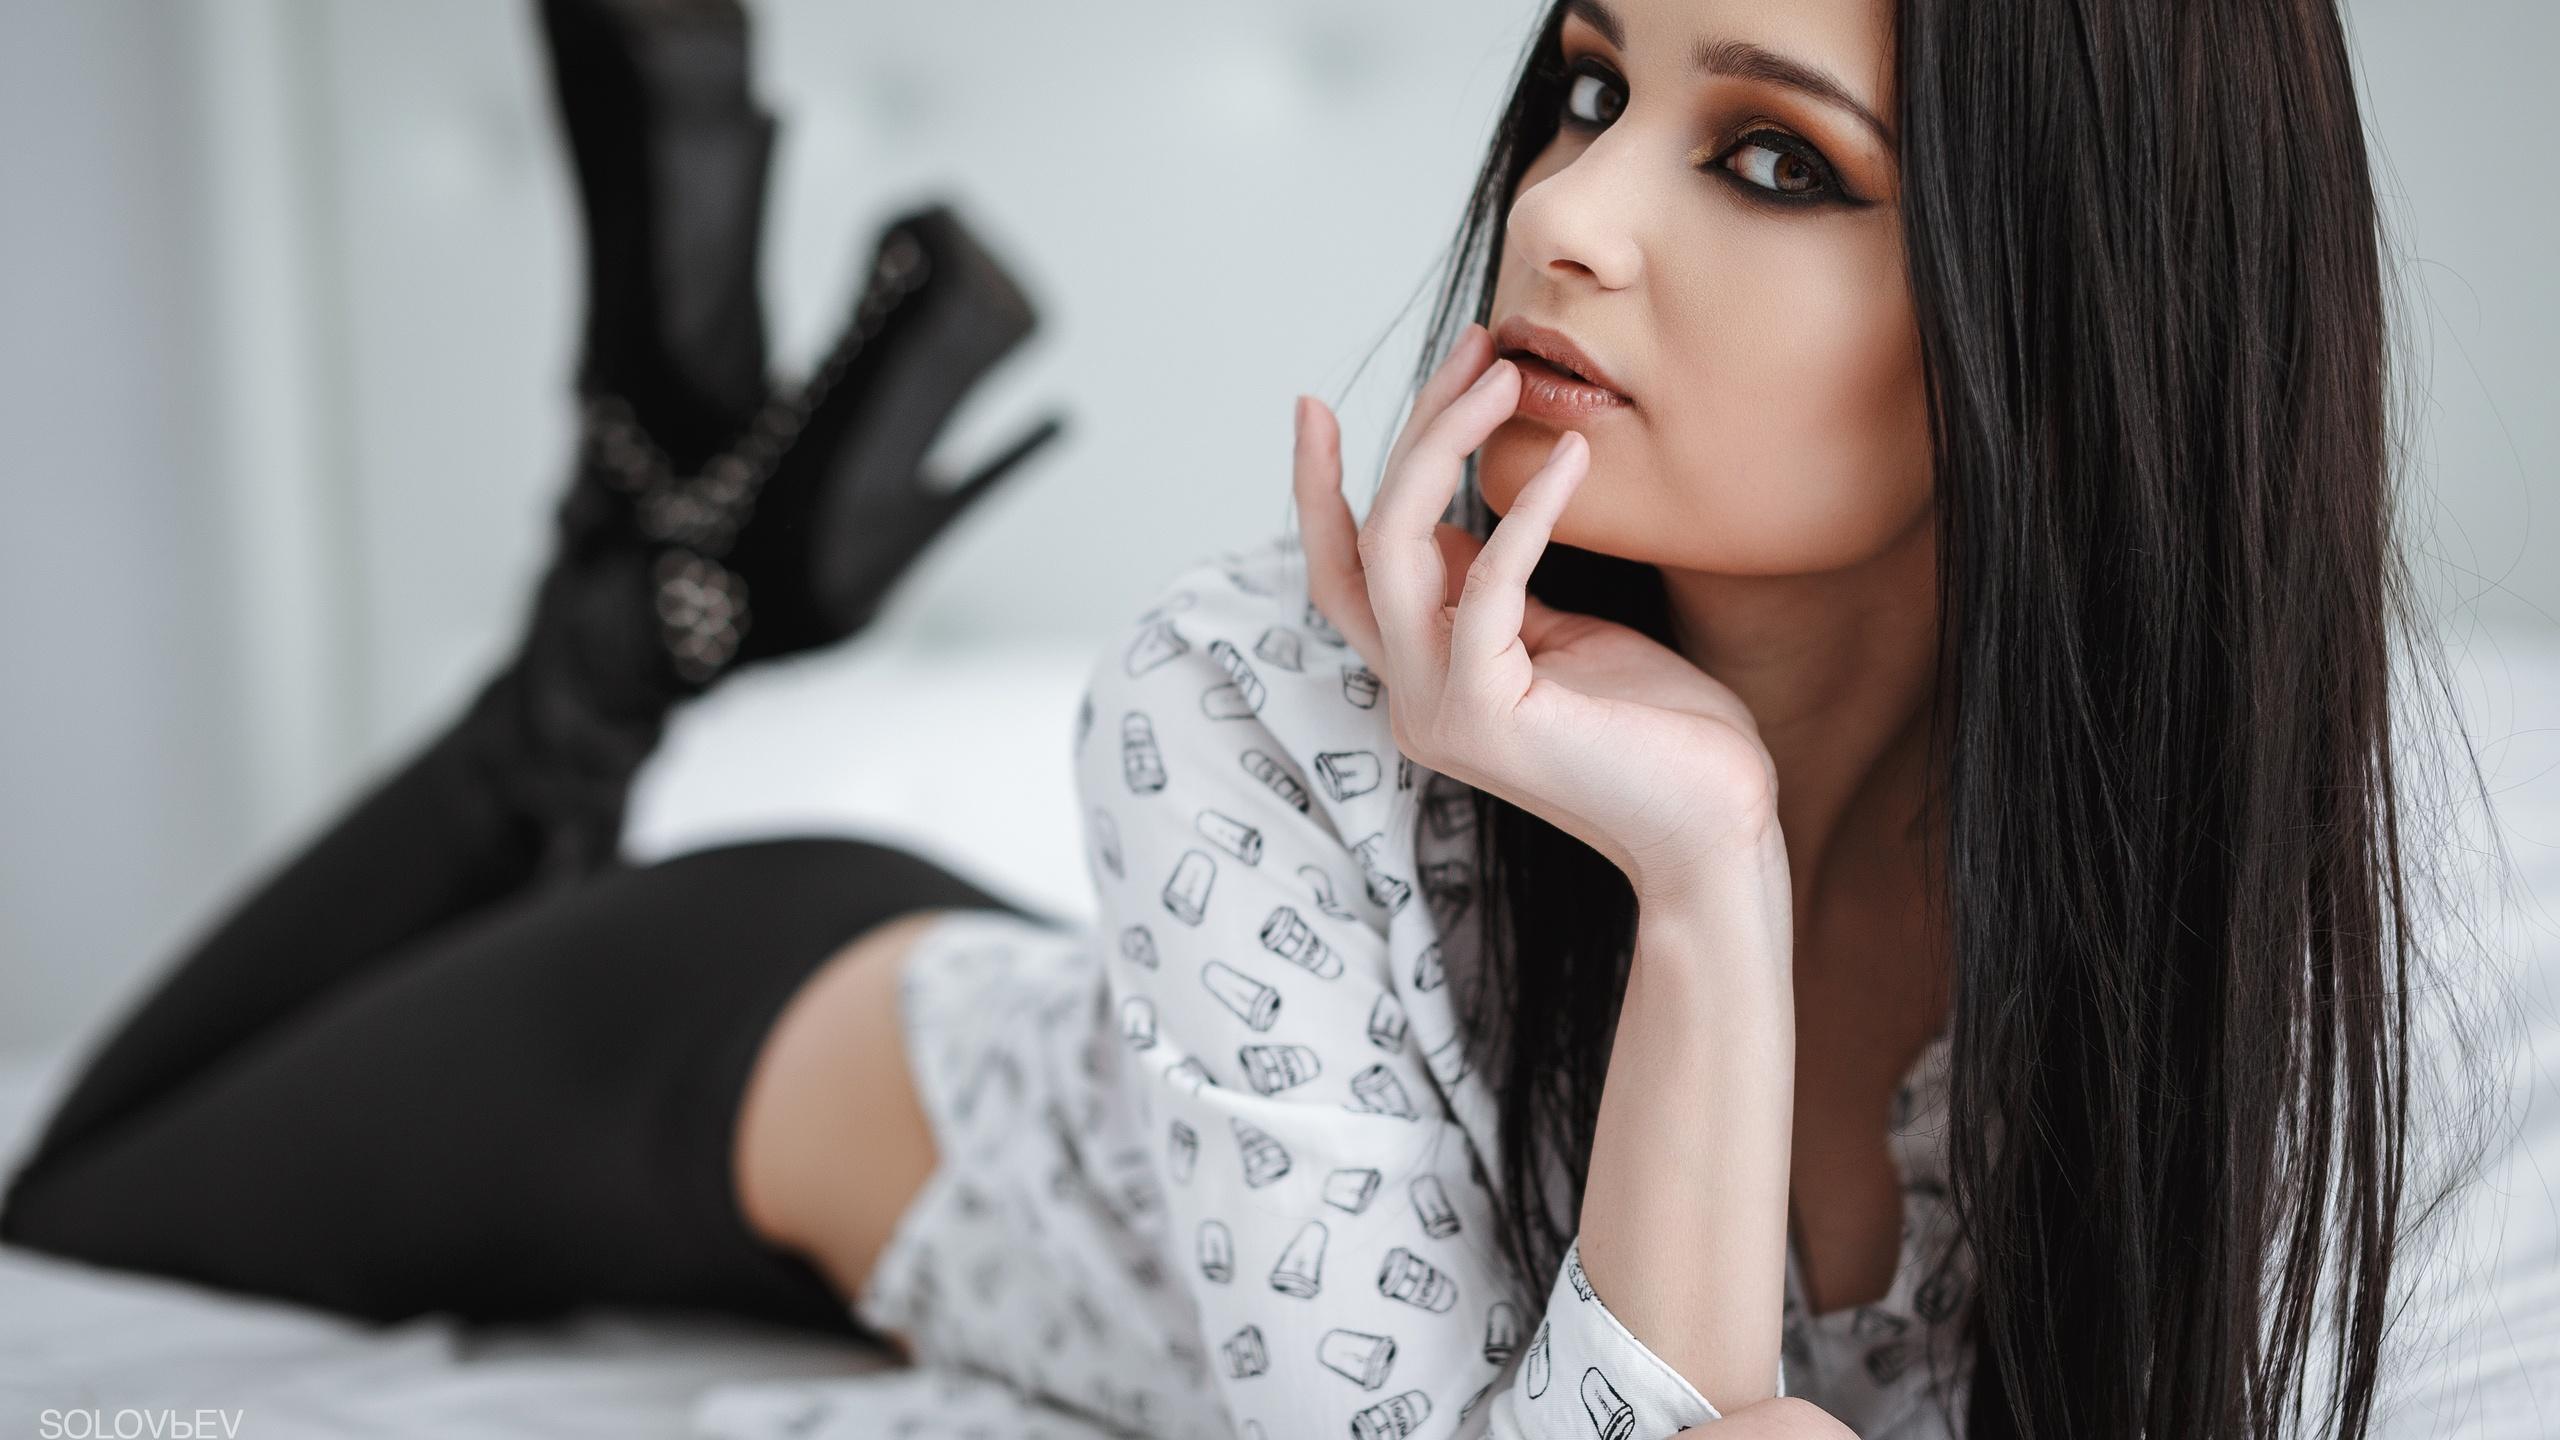 рука, взгляд, модель, волосы, solovьev, артем соловьев, hand, look, model, hair, artem soloviev, artem solovьev